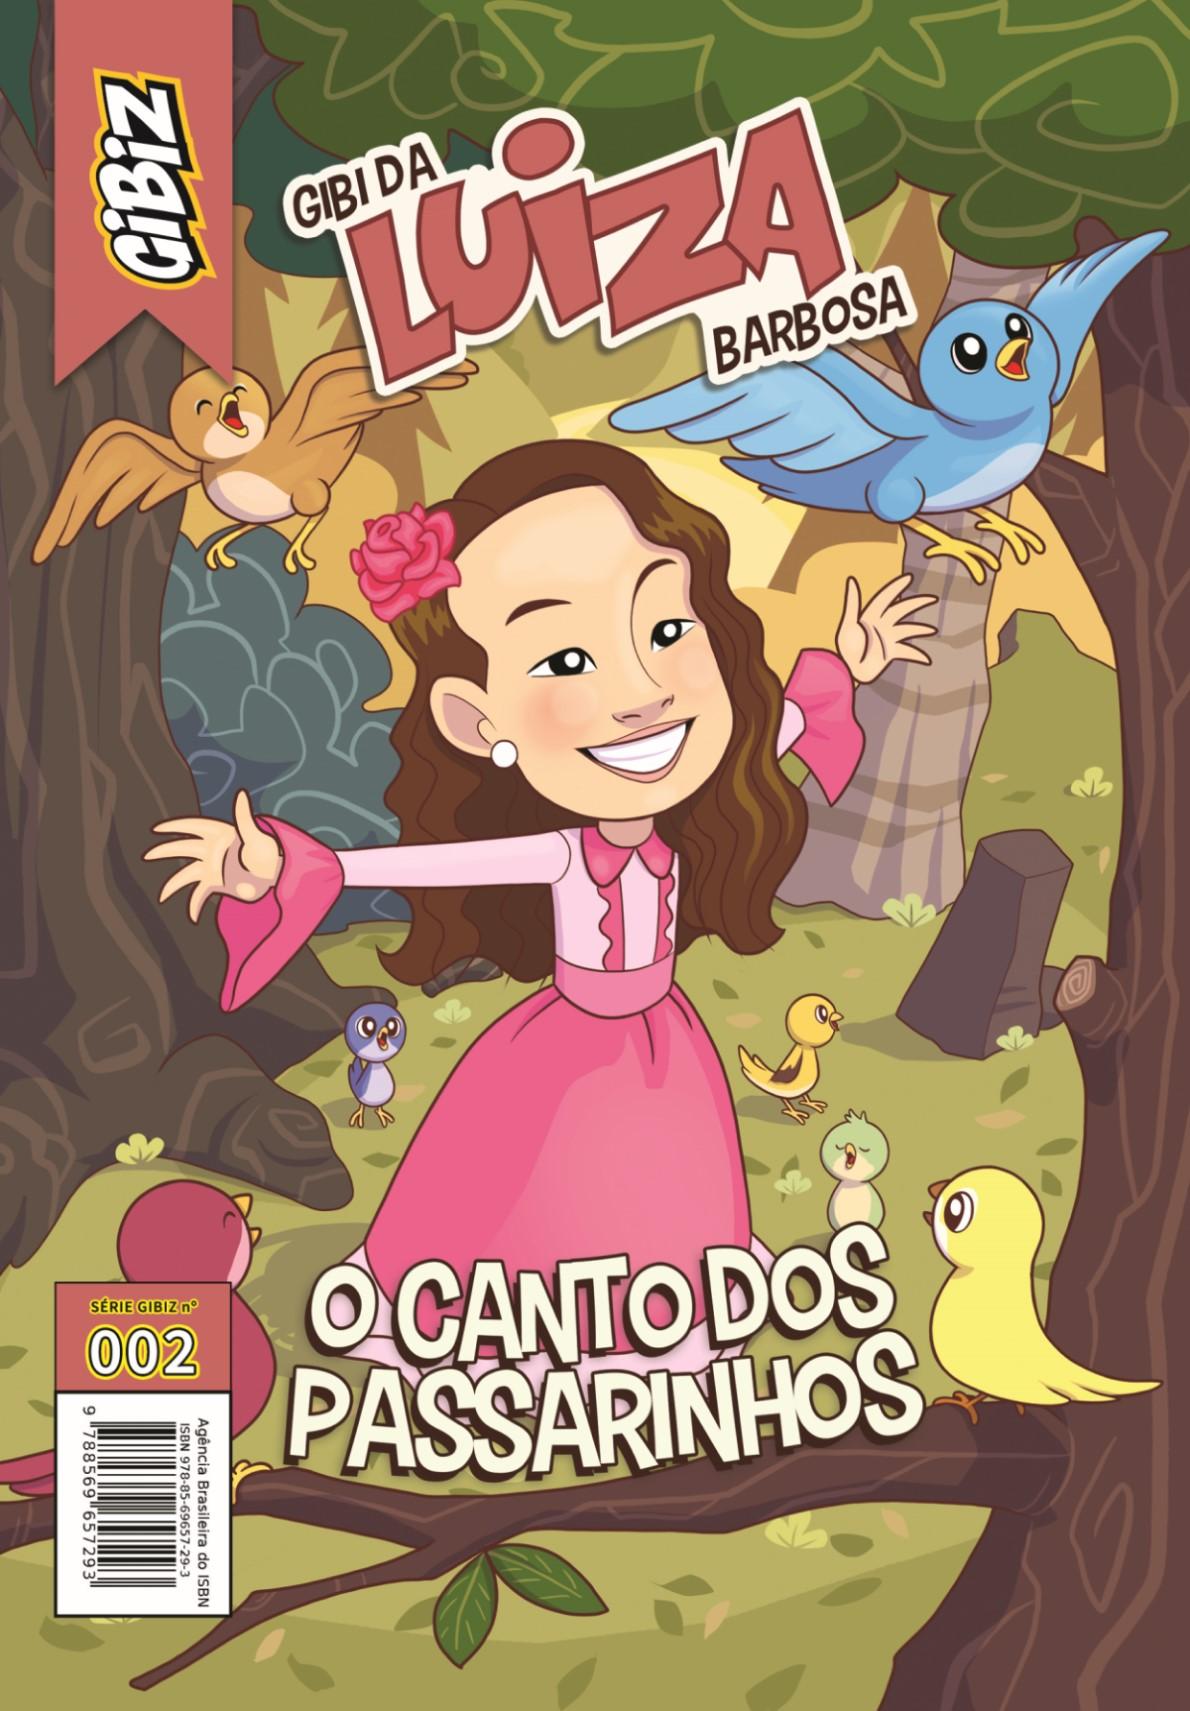 GIBI DA LUIZA BARBOSA - O CANTO DOS PASSARINHOS